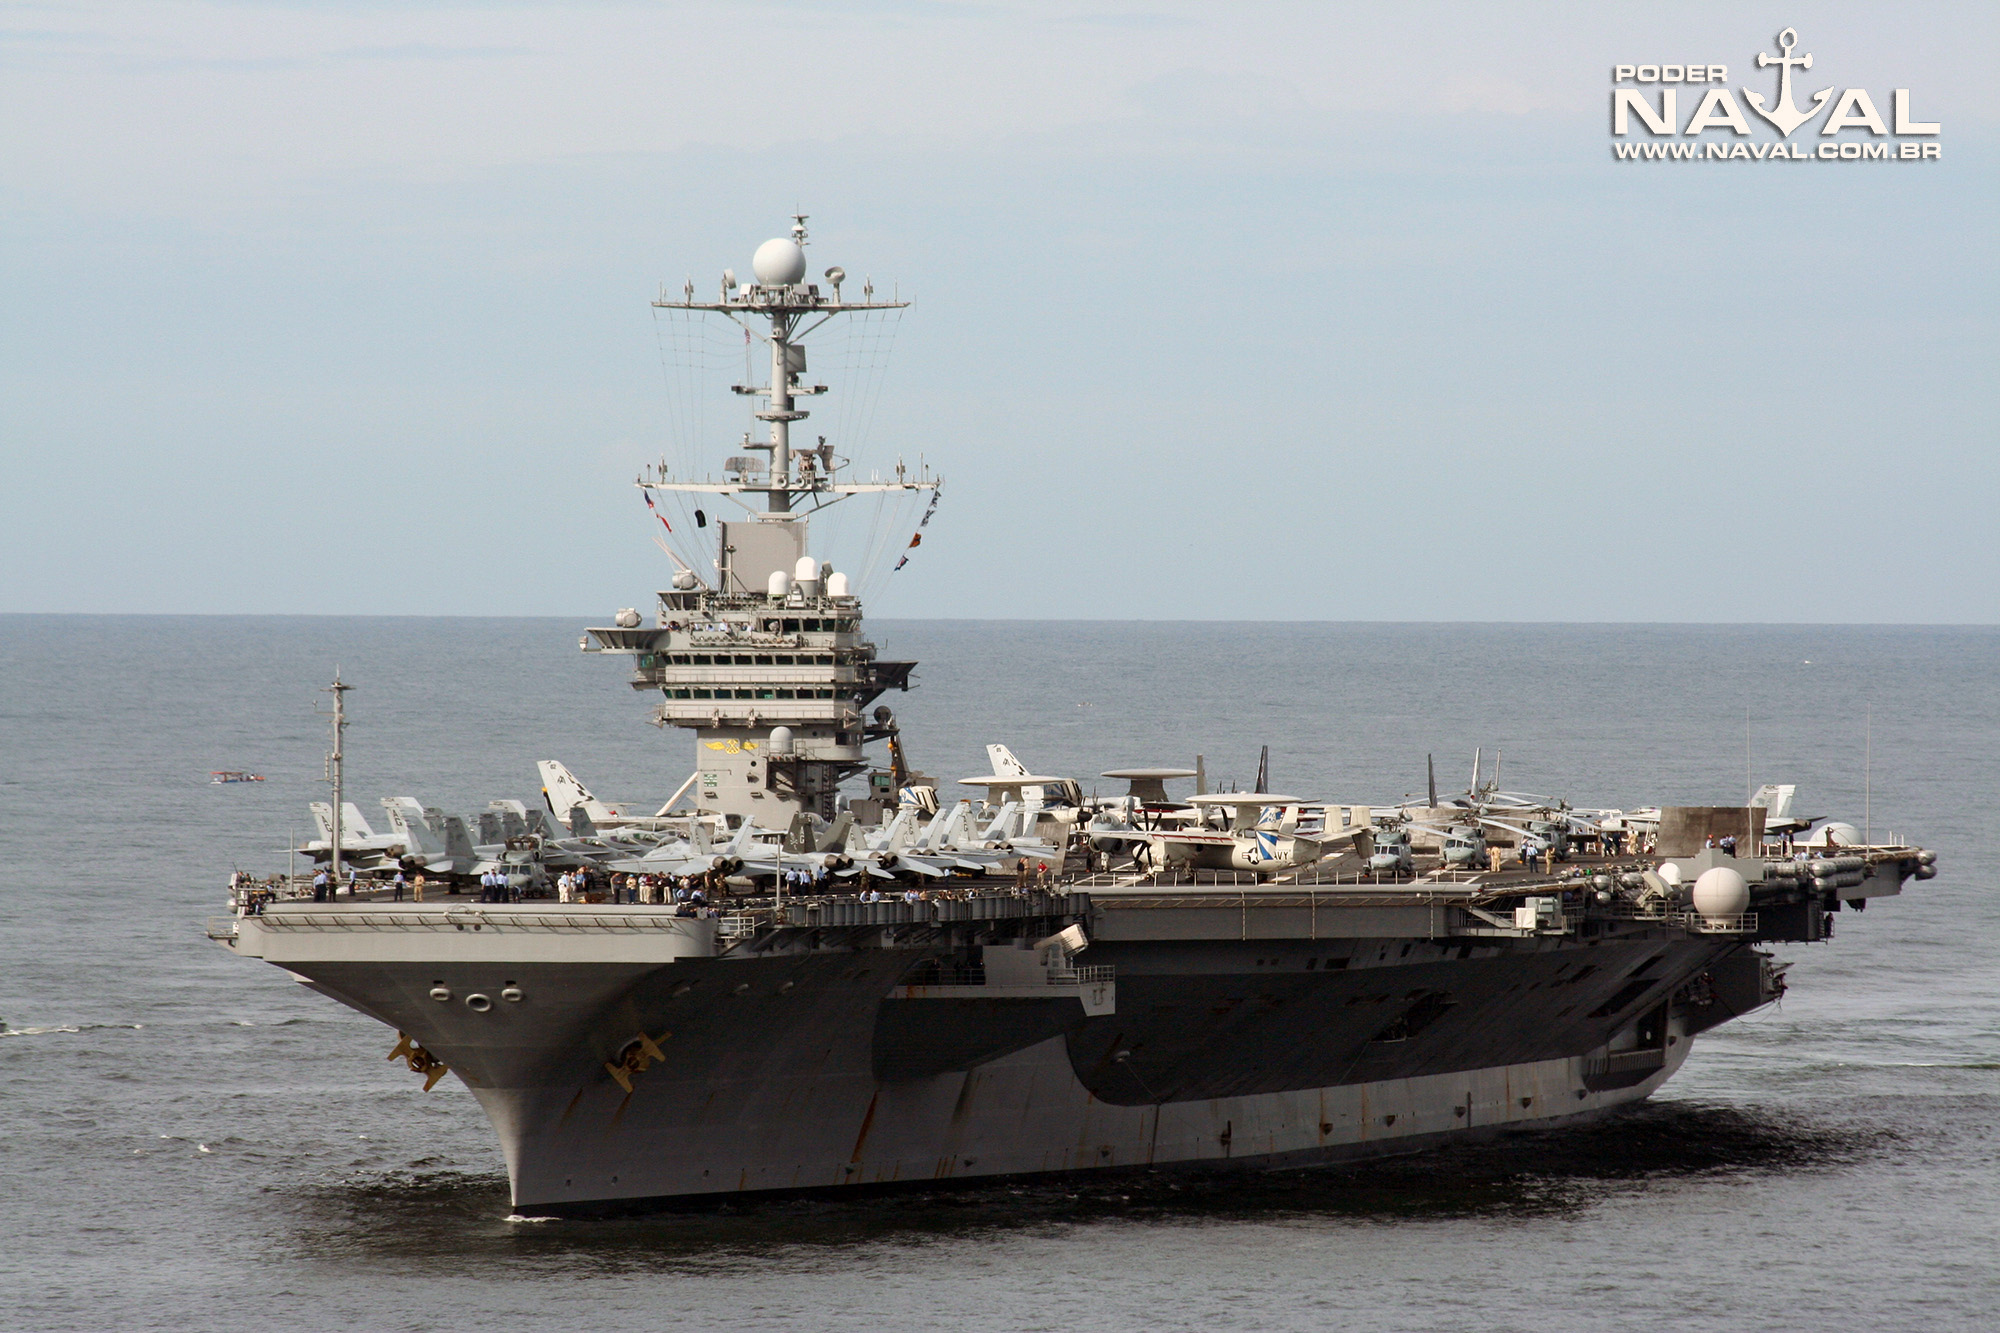 USS George Washington (CVN-73) no Rio - 2008 - 4b